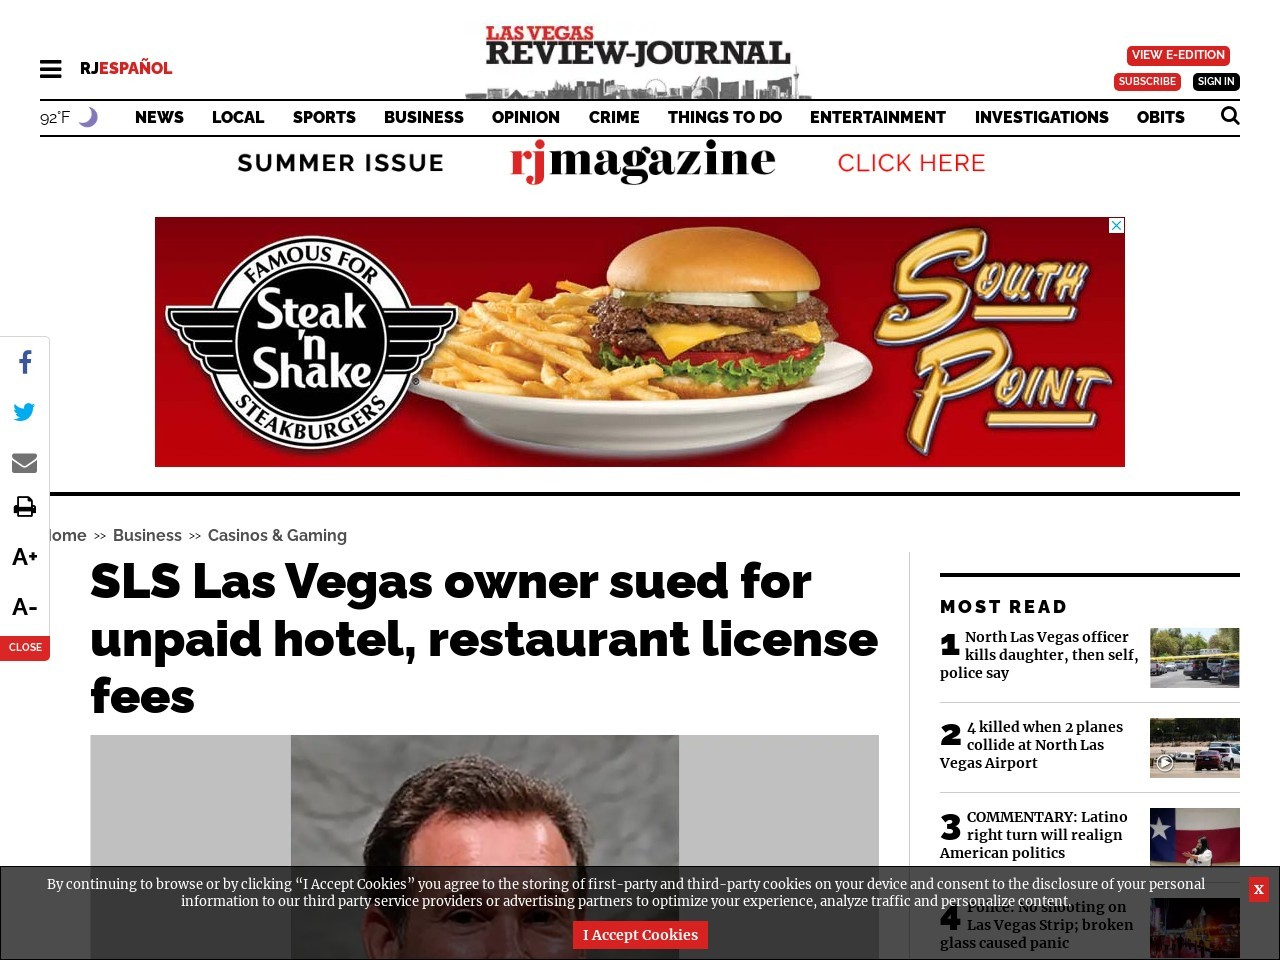 SLS Las Vegas owner sued for unpaid hotel, restaurant license fees